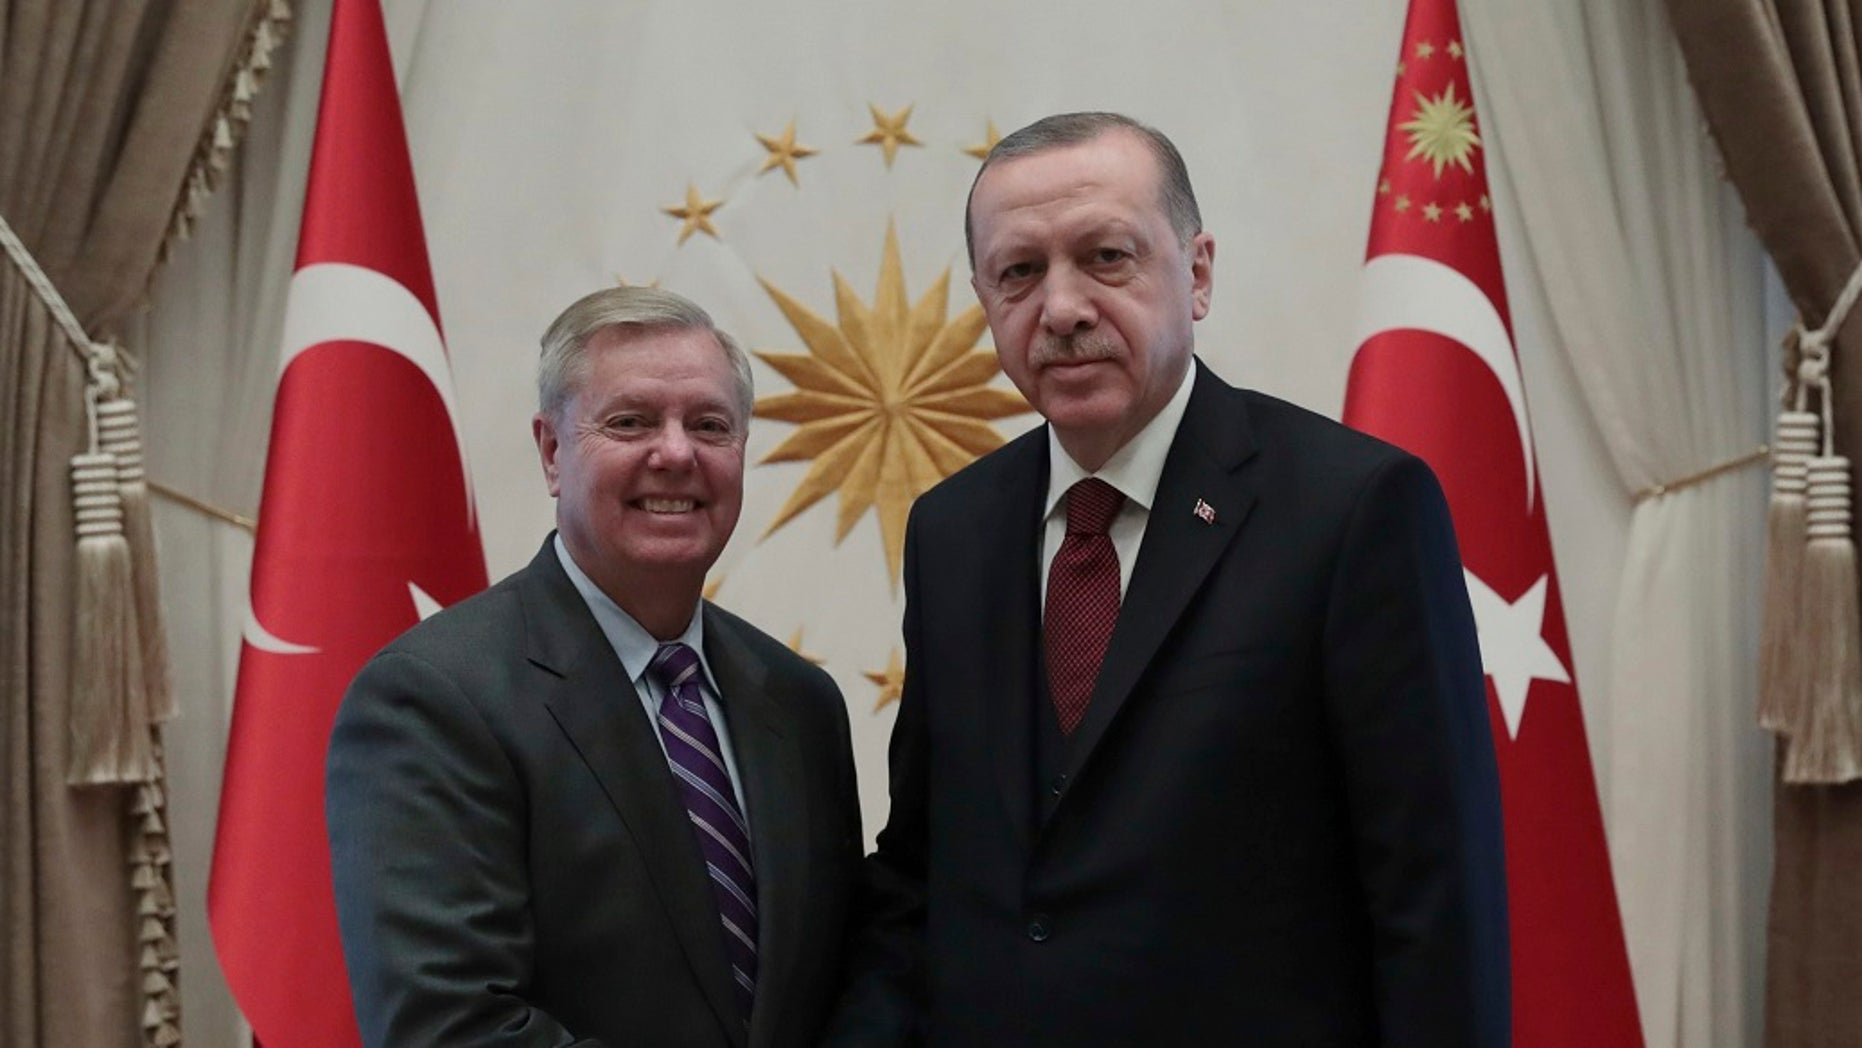 U.S. Sen. Lindsey Graham, R-S.C., left, meets with Turkey's President Recep Tayyip Erdogan, in Ankara, Turkey, Jan. 18, 2019. (Presidential Press Service via AP, Pool)